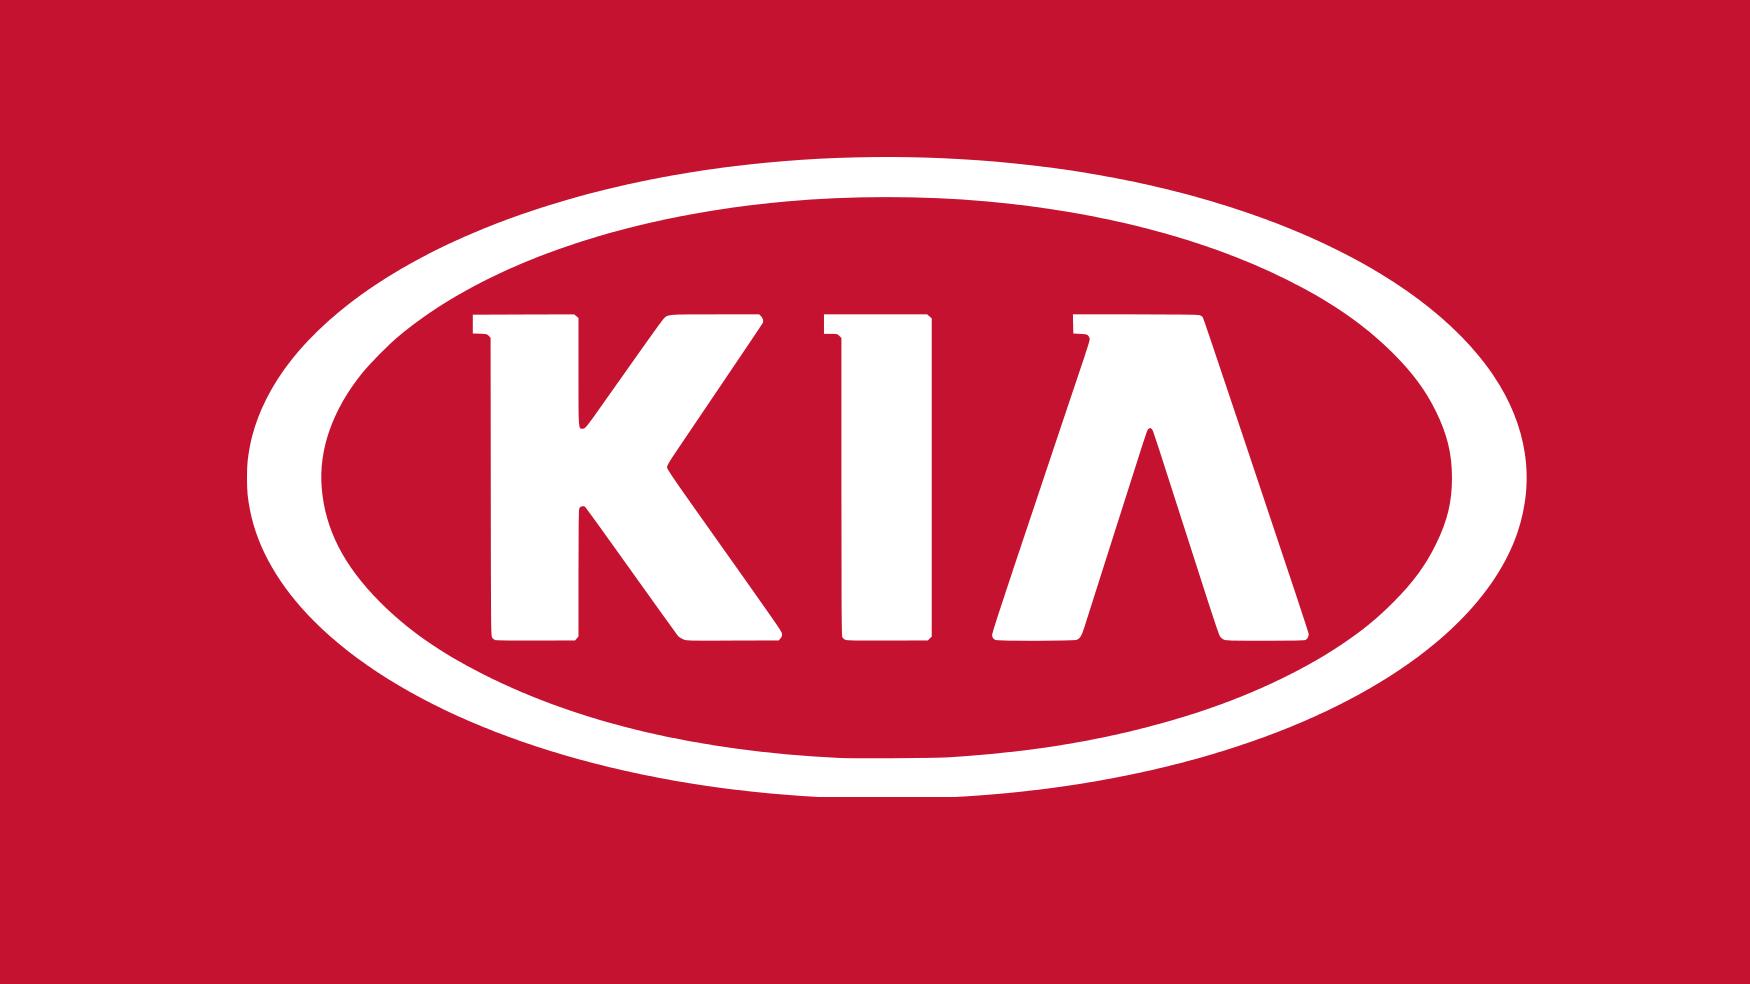 All Car Logos Wallpapers Im 225 Genes De Kia Logo Im 225 Genes